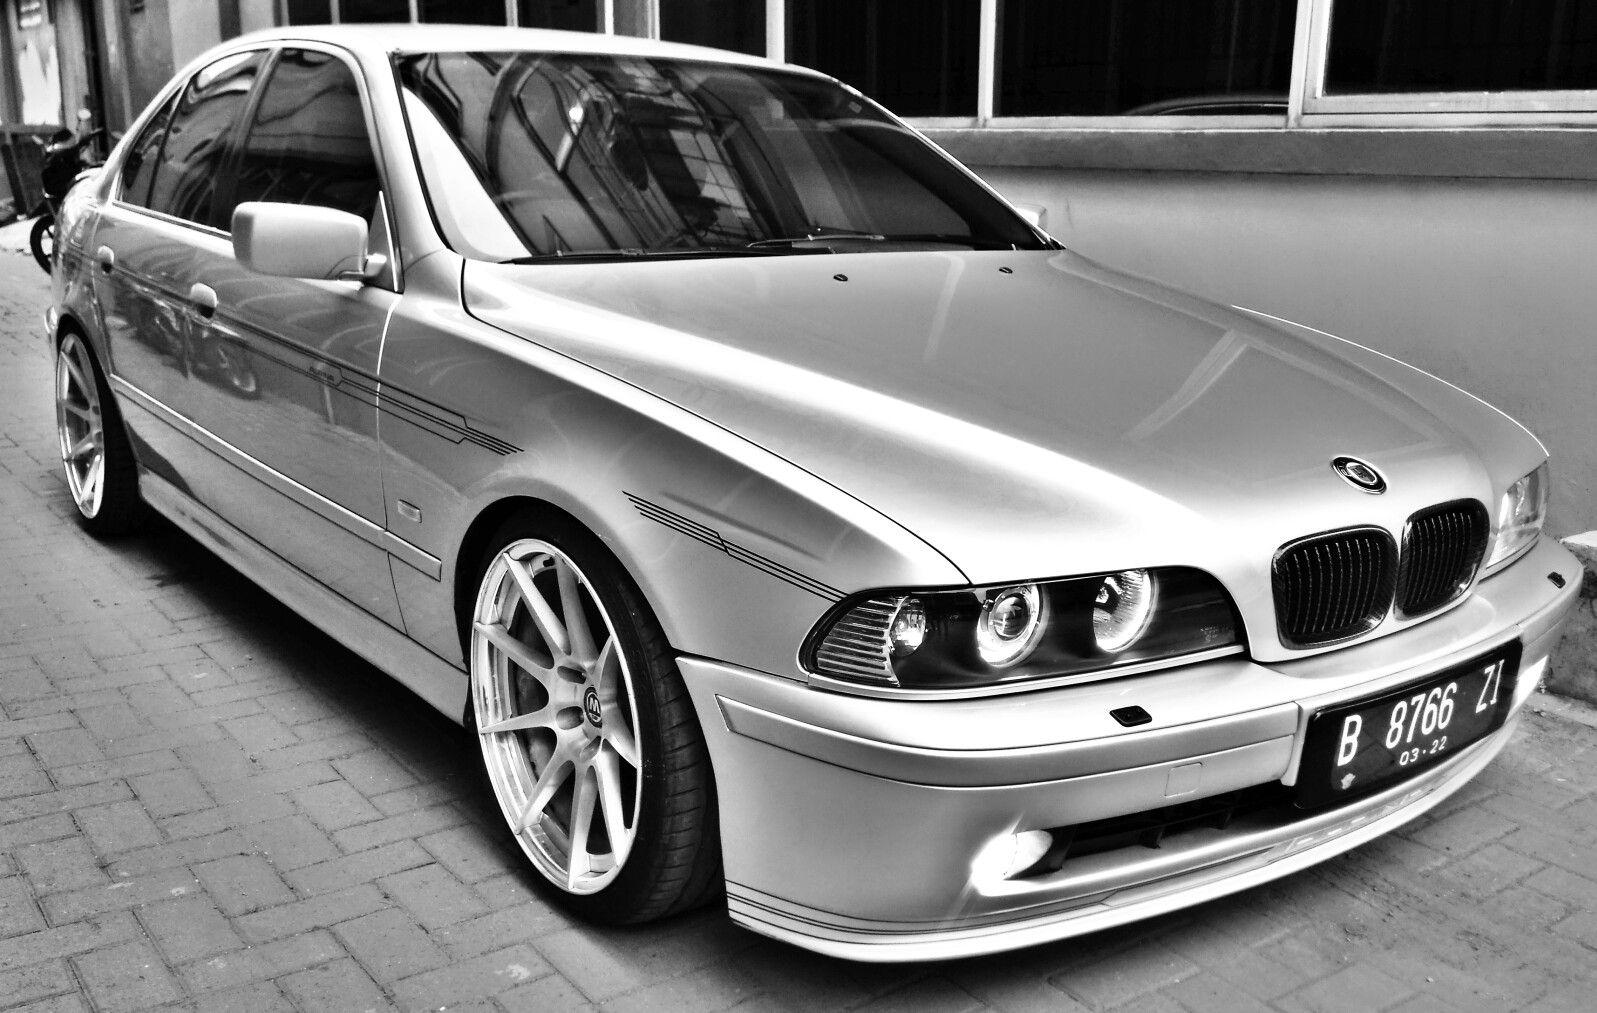 E39 Alpina With Images Bmw Bmw Classic Cars Bmw Alpina